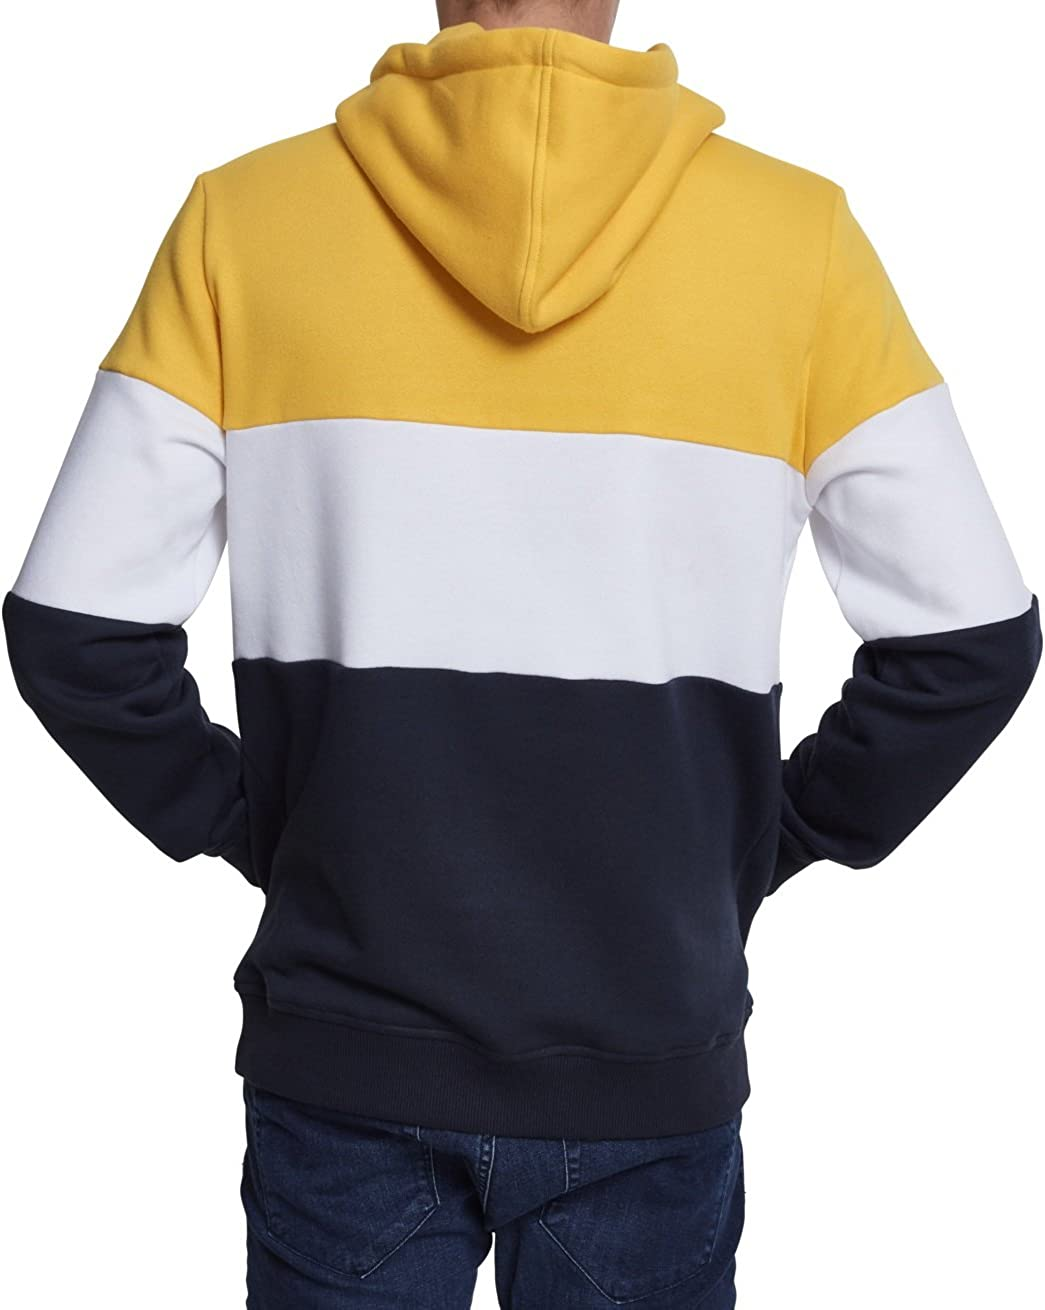 Urban Classics Herren Kapuzenpullover Mehrfarbig (Chrome Yellow/White/Navy 01233)